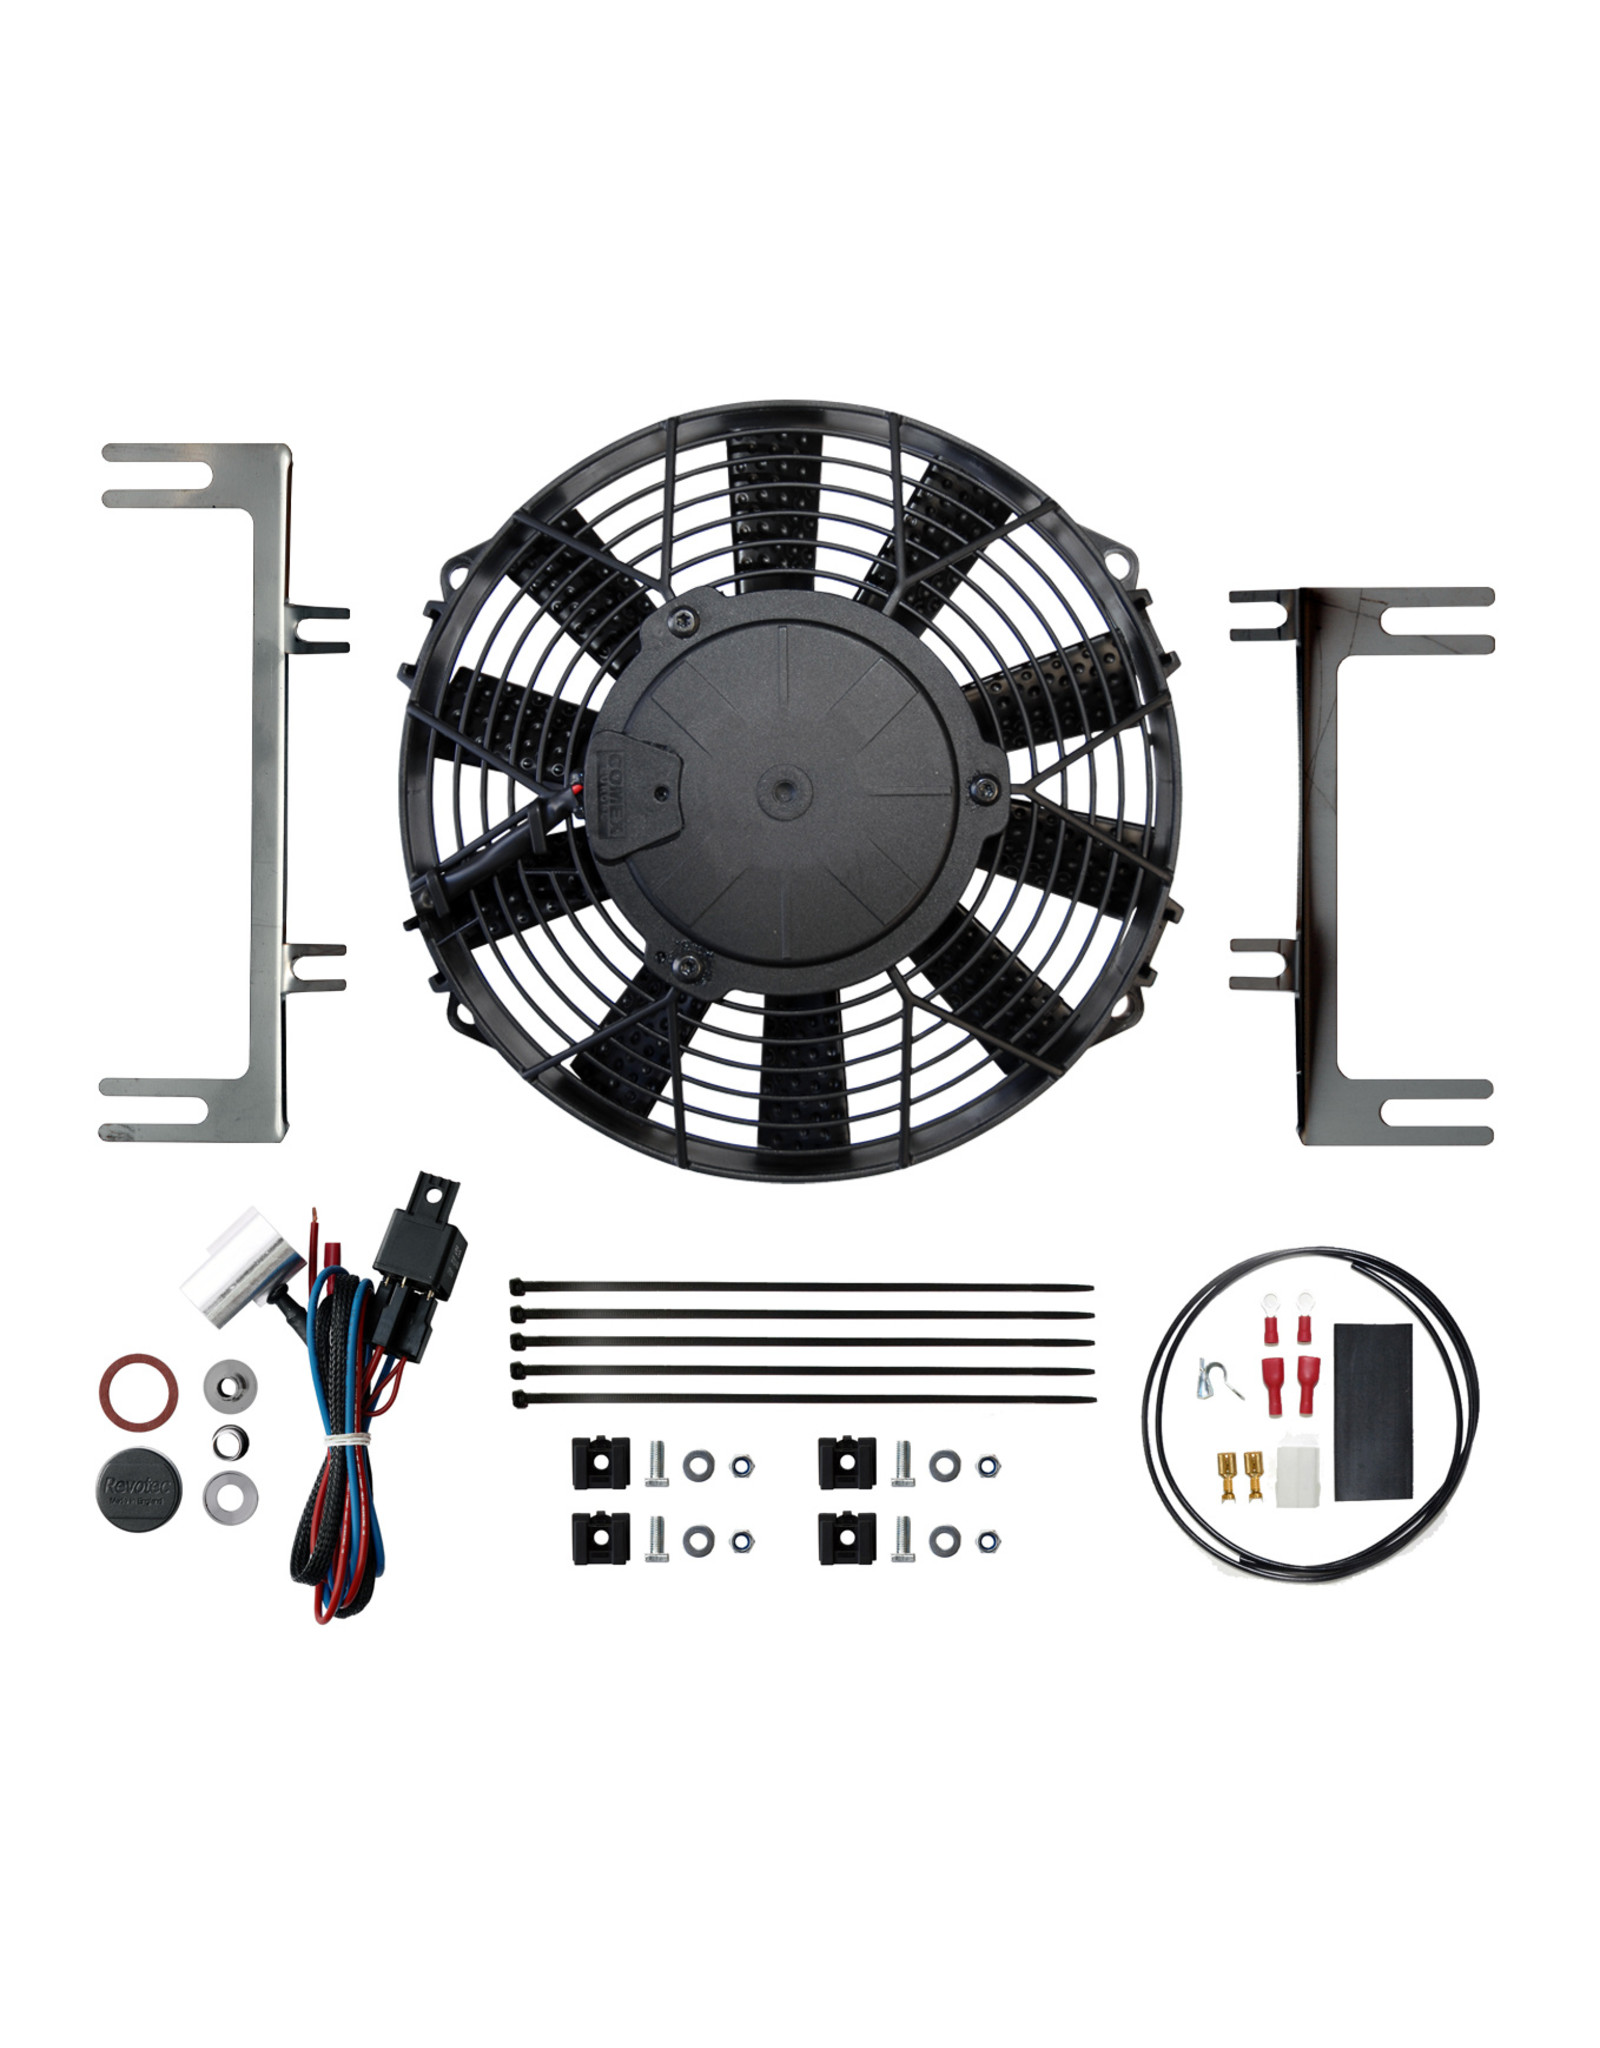 Revotec Mini Classic (Side Mounted Radiator) Cooling Fan Kit